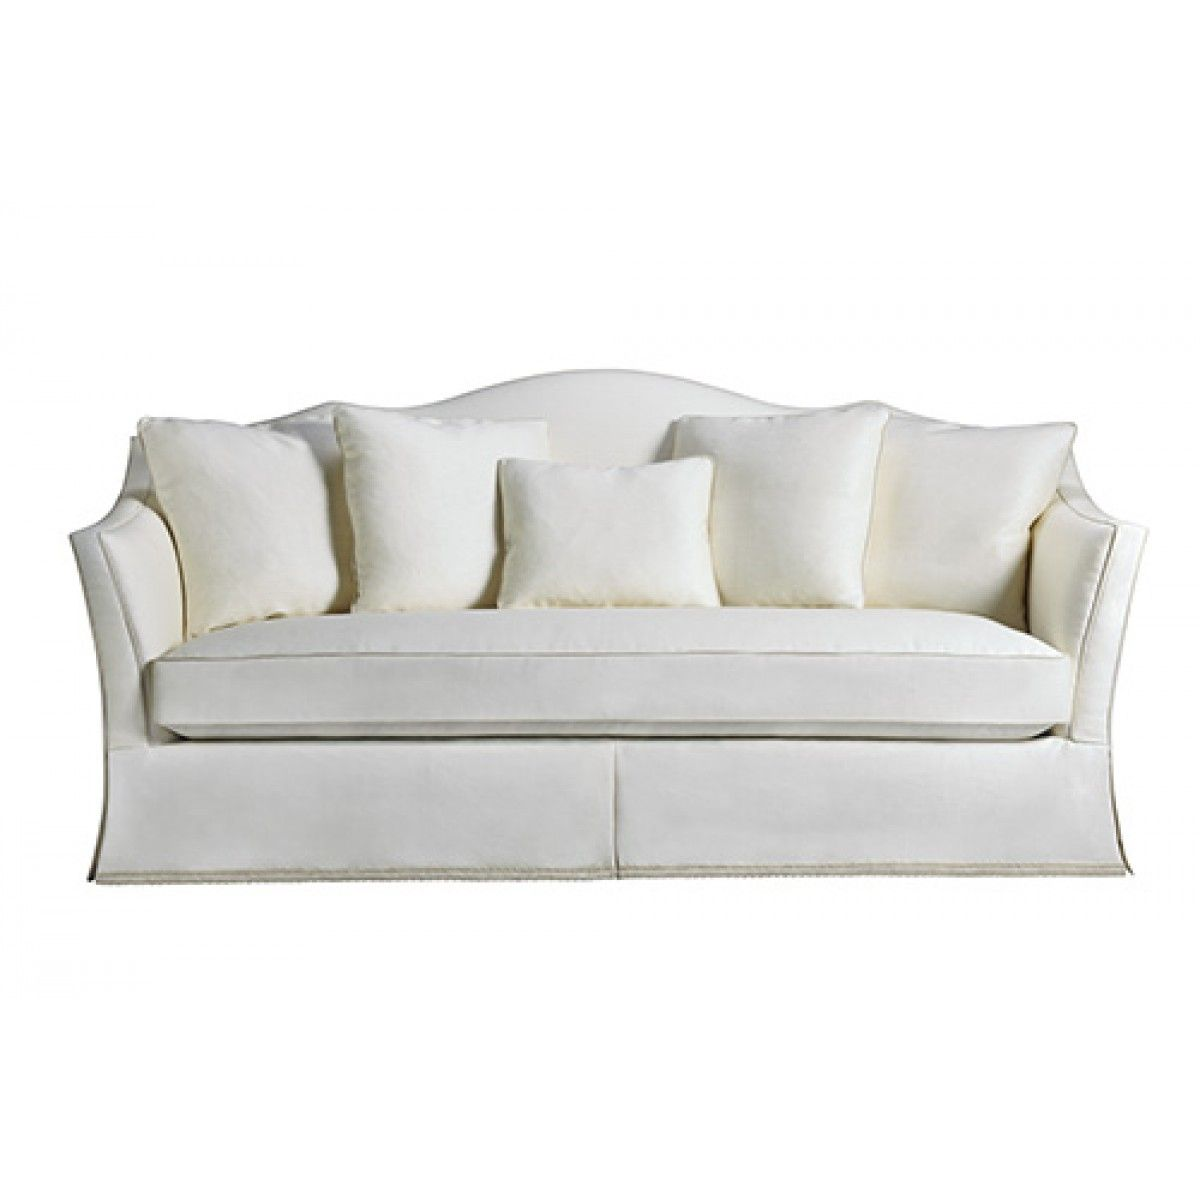 Baker Classics Camelback Sofa 6536s Sofa Couch Design White